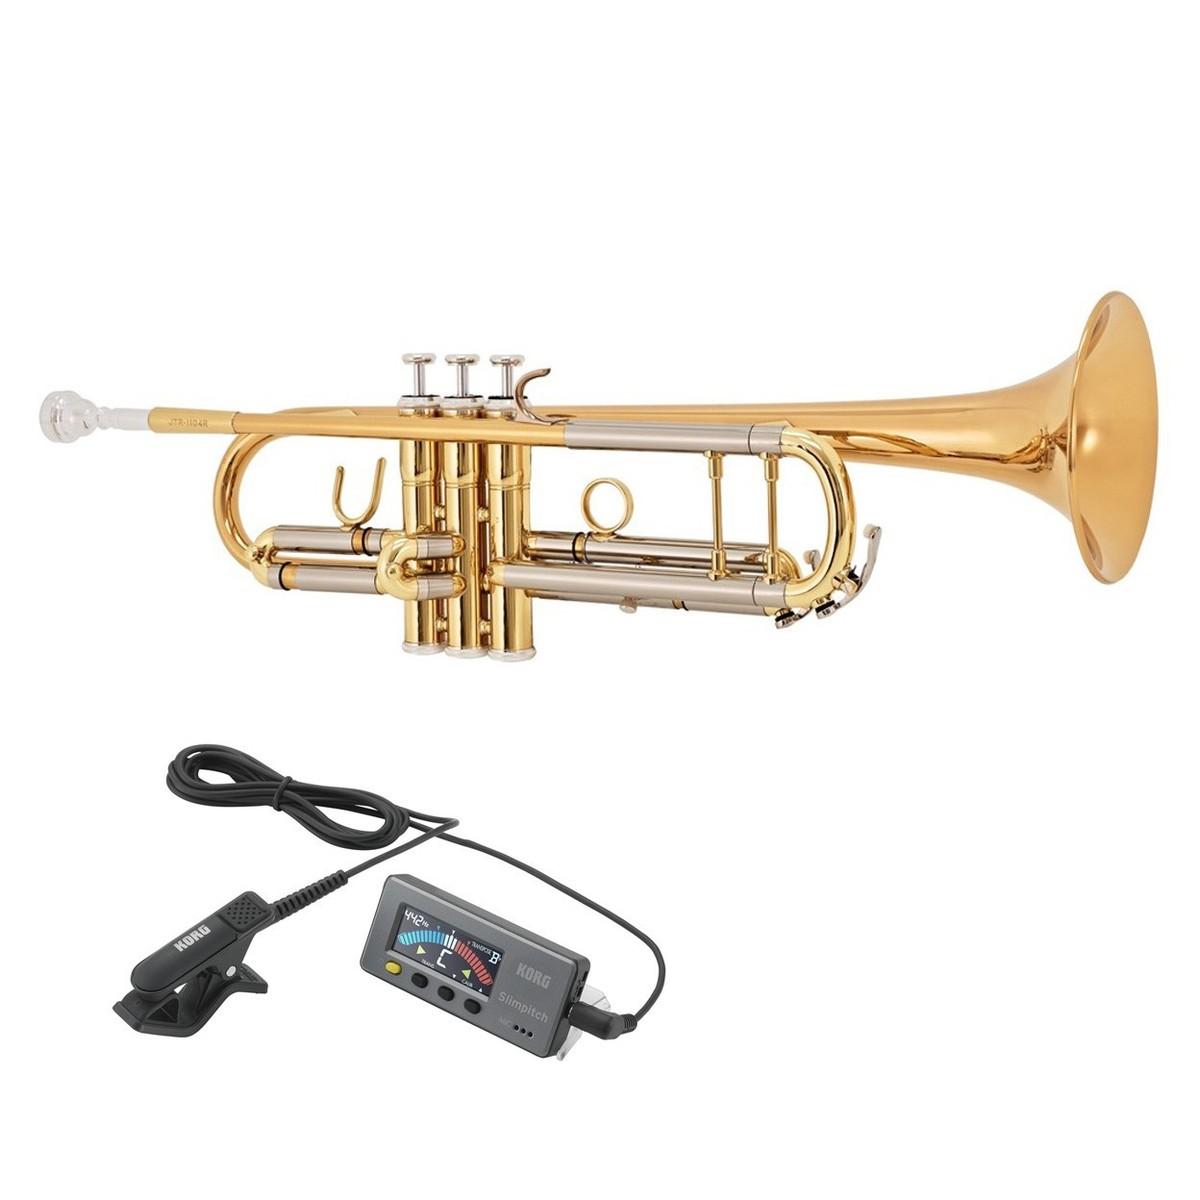 Image of Jupiter JTR-1104RL Trumpet with Free Slimpitch Tuner